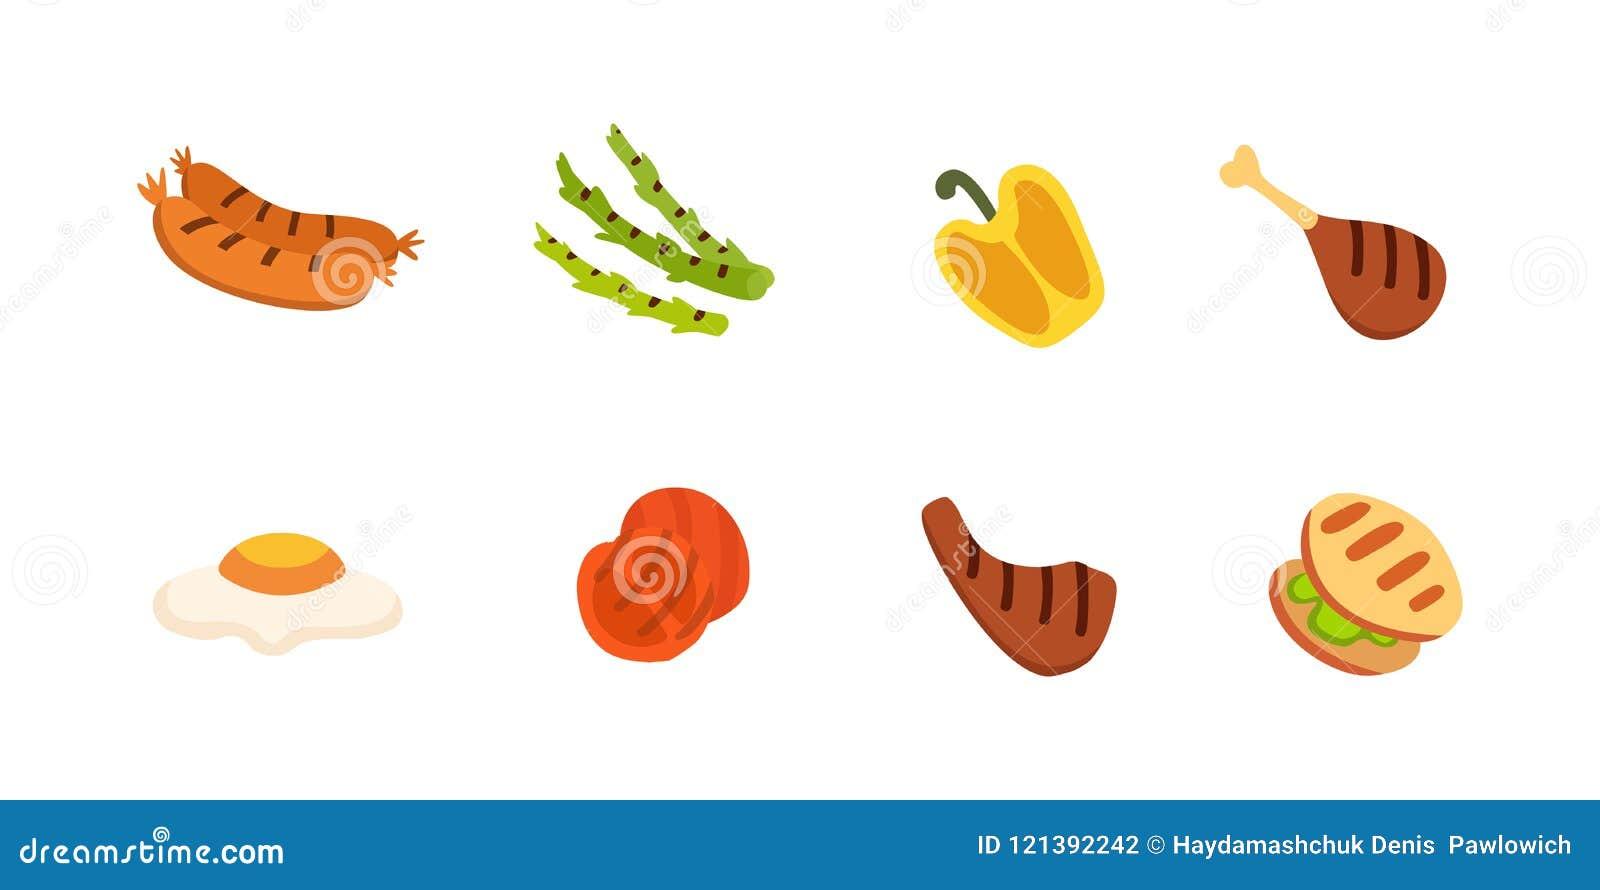 Barbecue icons set. Grill food, bbq, roast, steak cartoon vector illustration.